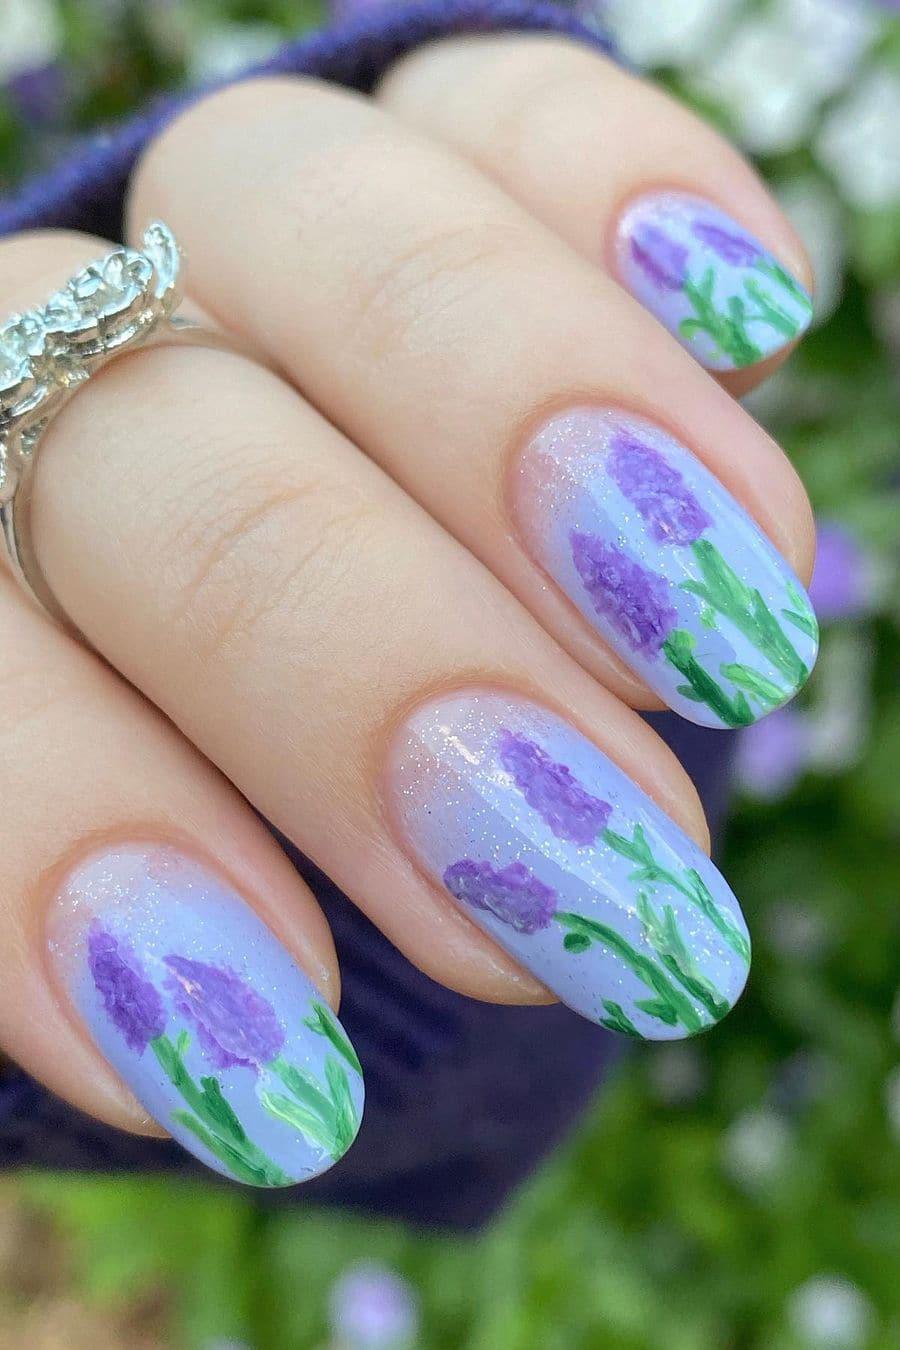 Lavender oval nails